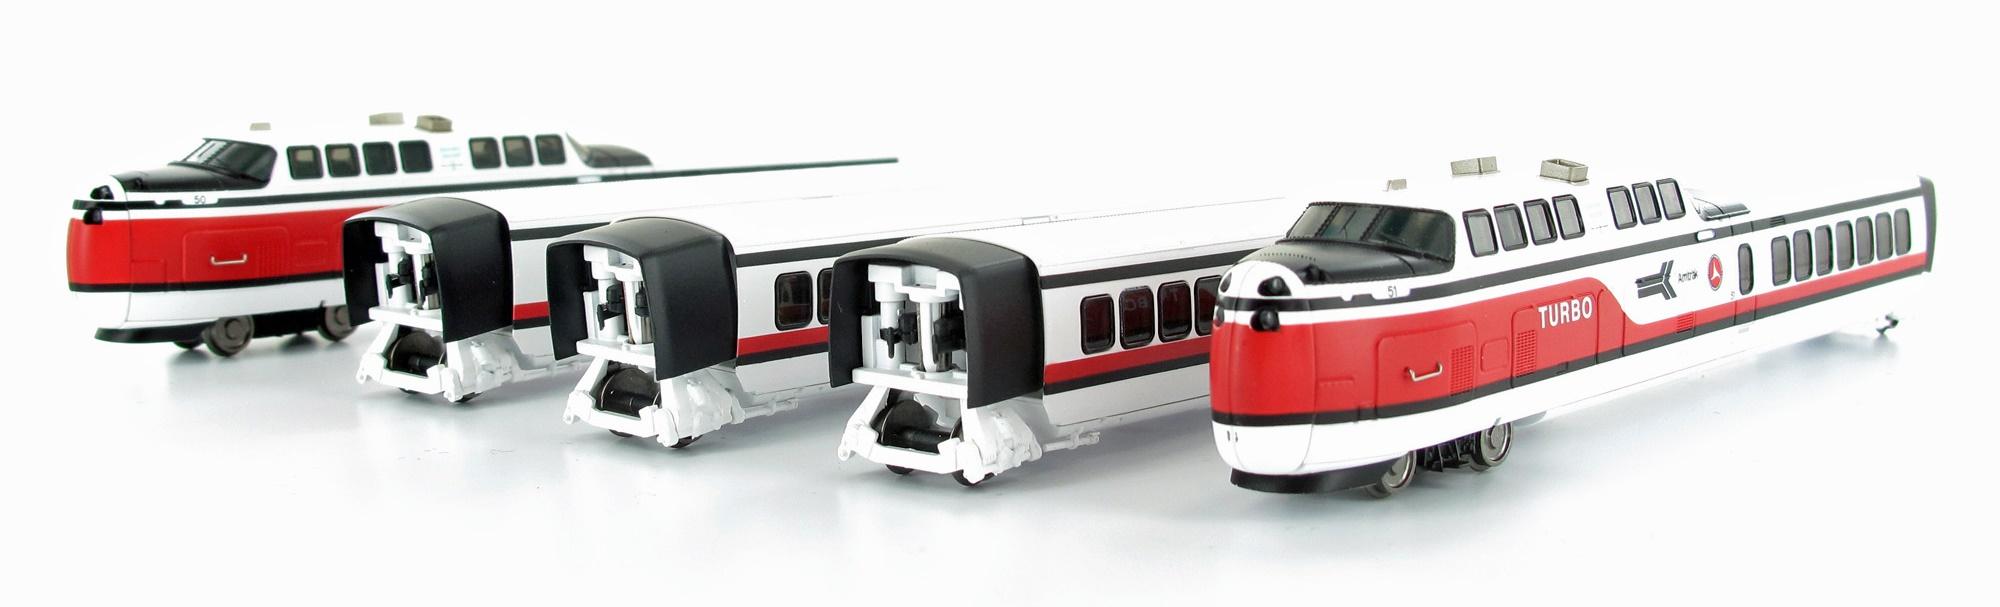 N Scale - Rapido Trains - 520503 - Passenger Train, TurboTrain - Amtrak